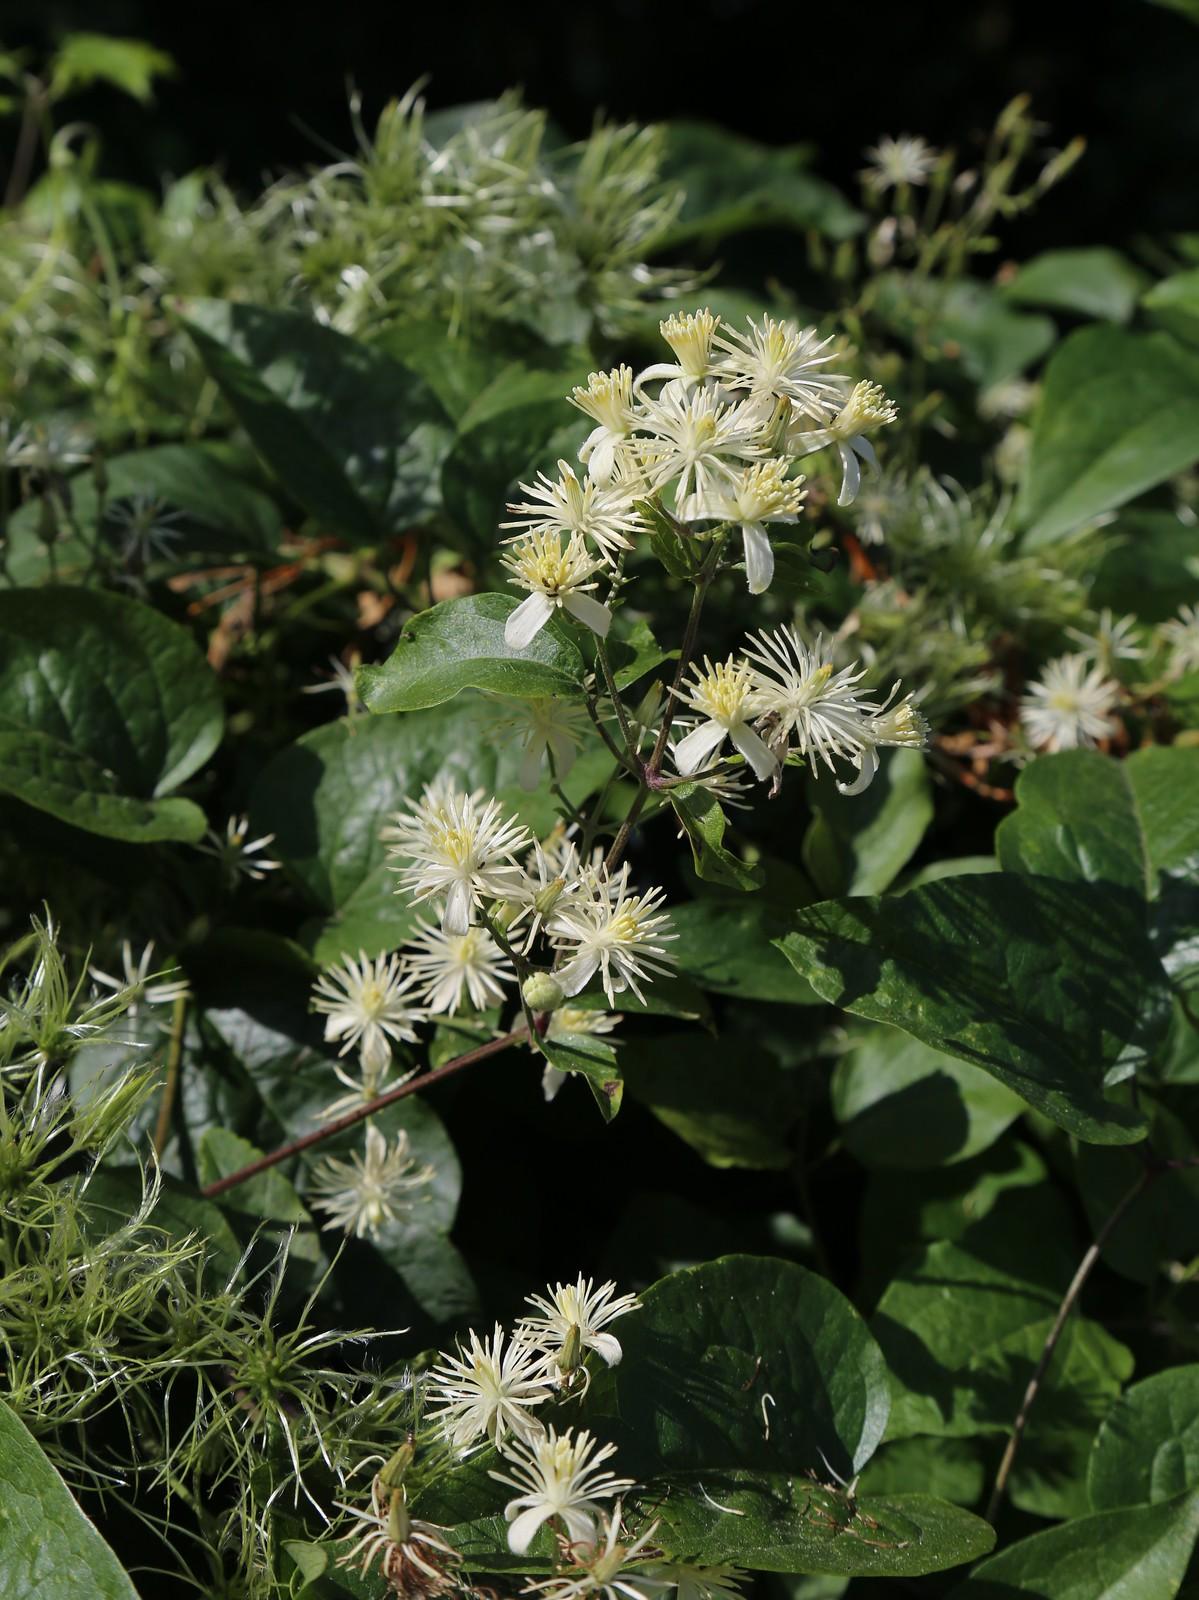 Old Man's Beard flowers - Glynde